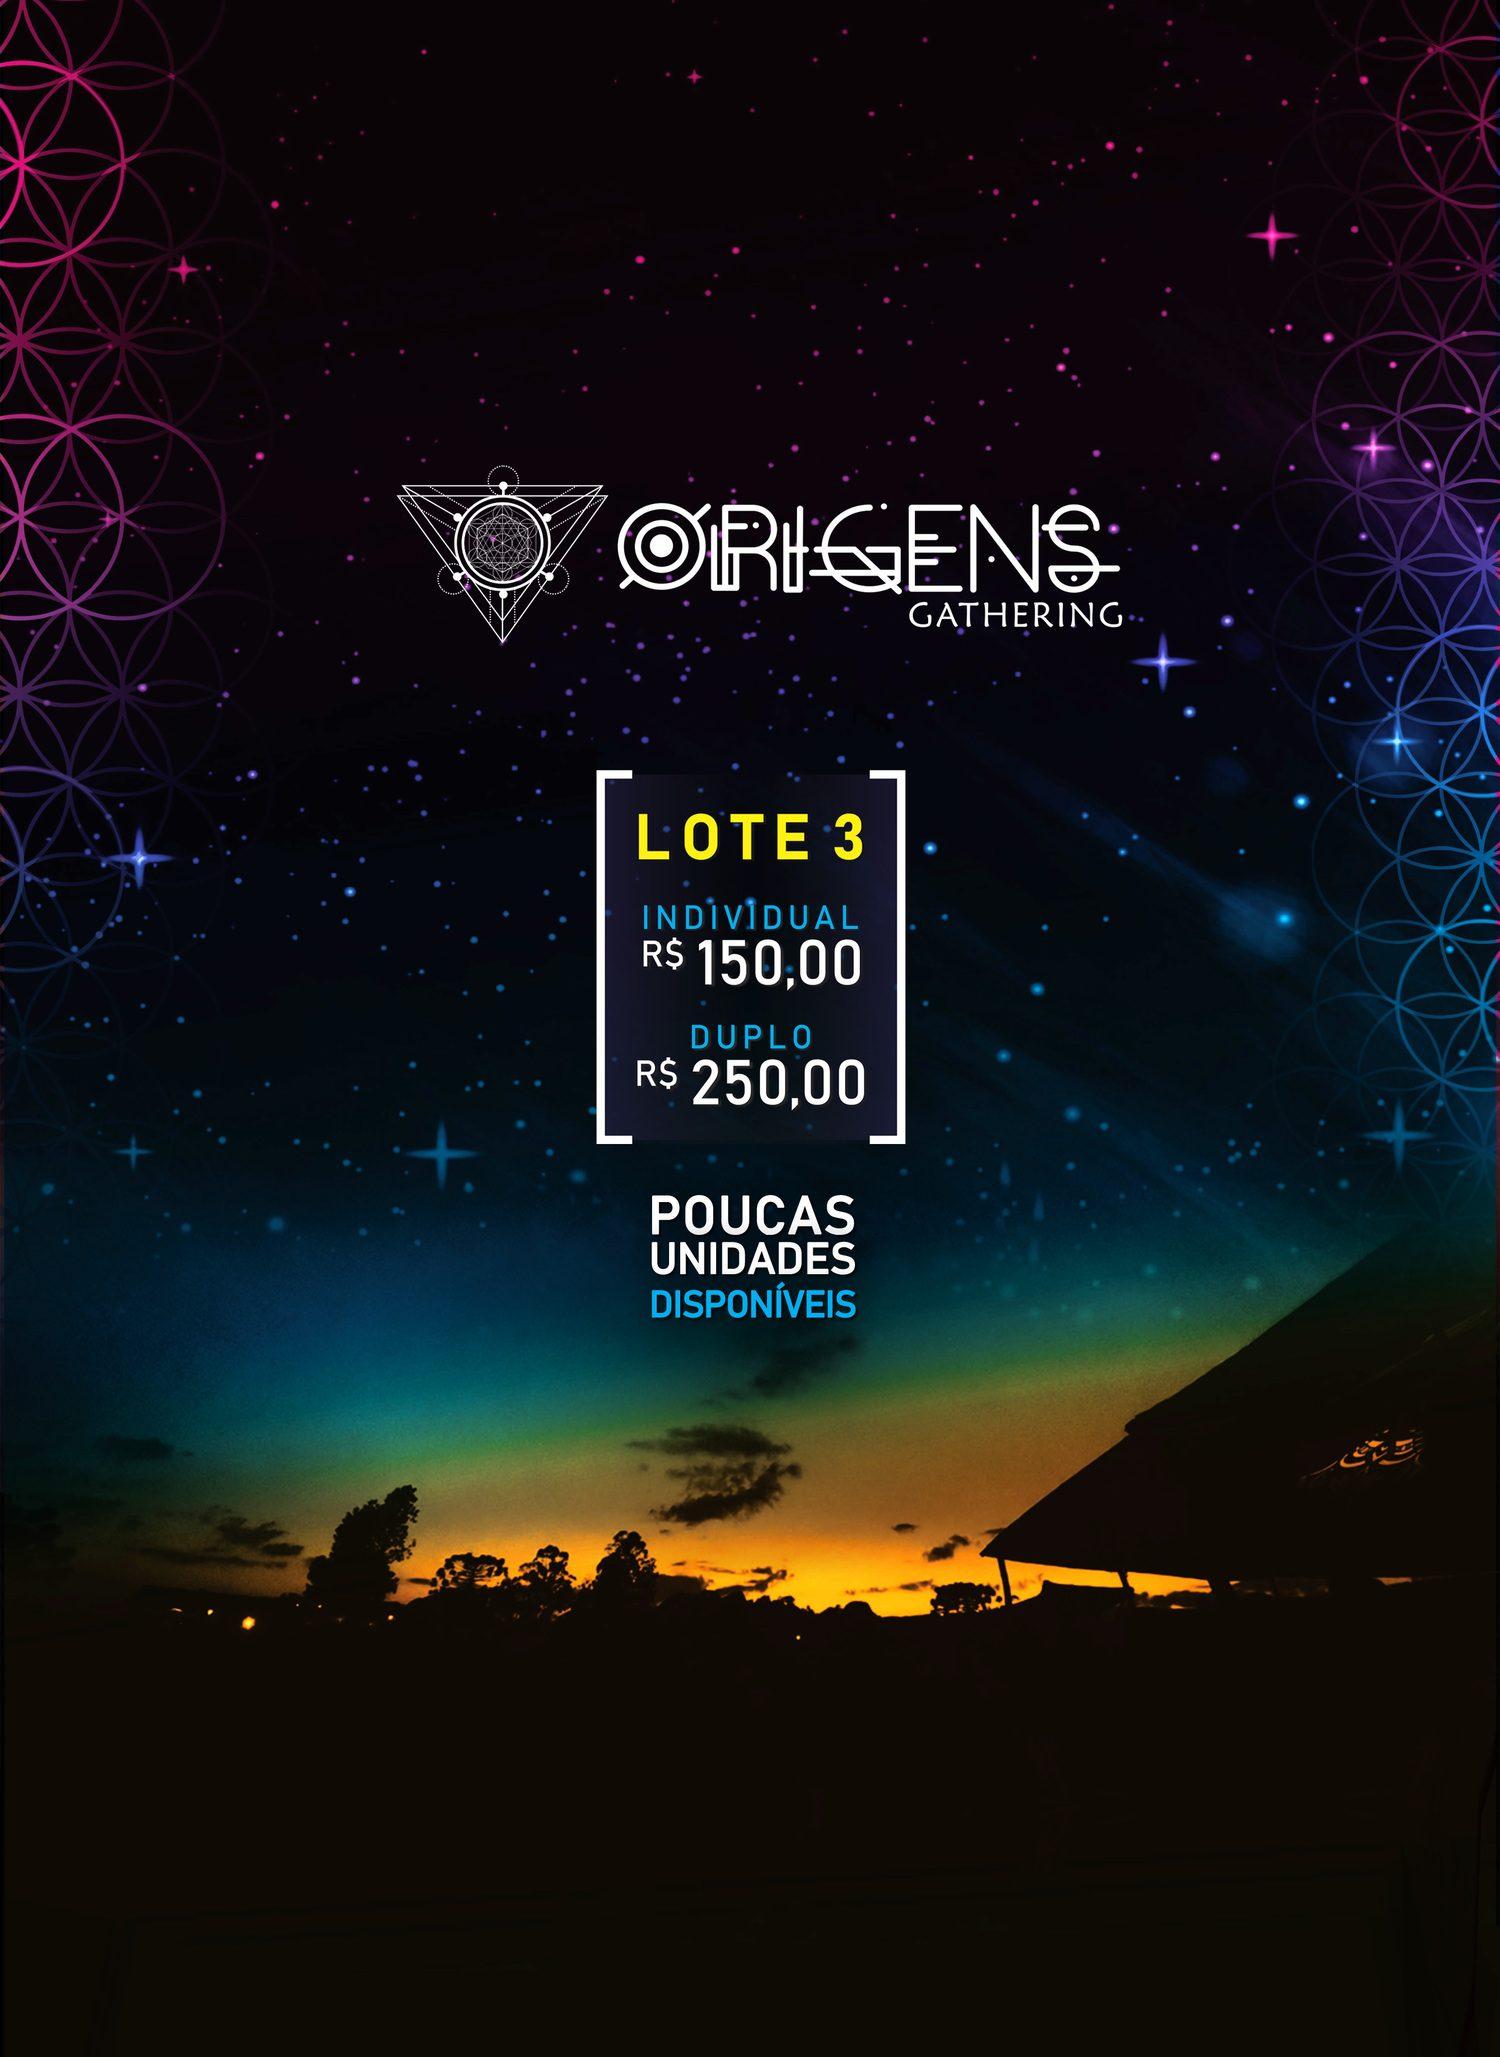 Ingresso Origens Festival - 3º Lote - Passaporte Duplo